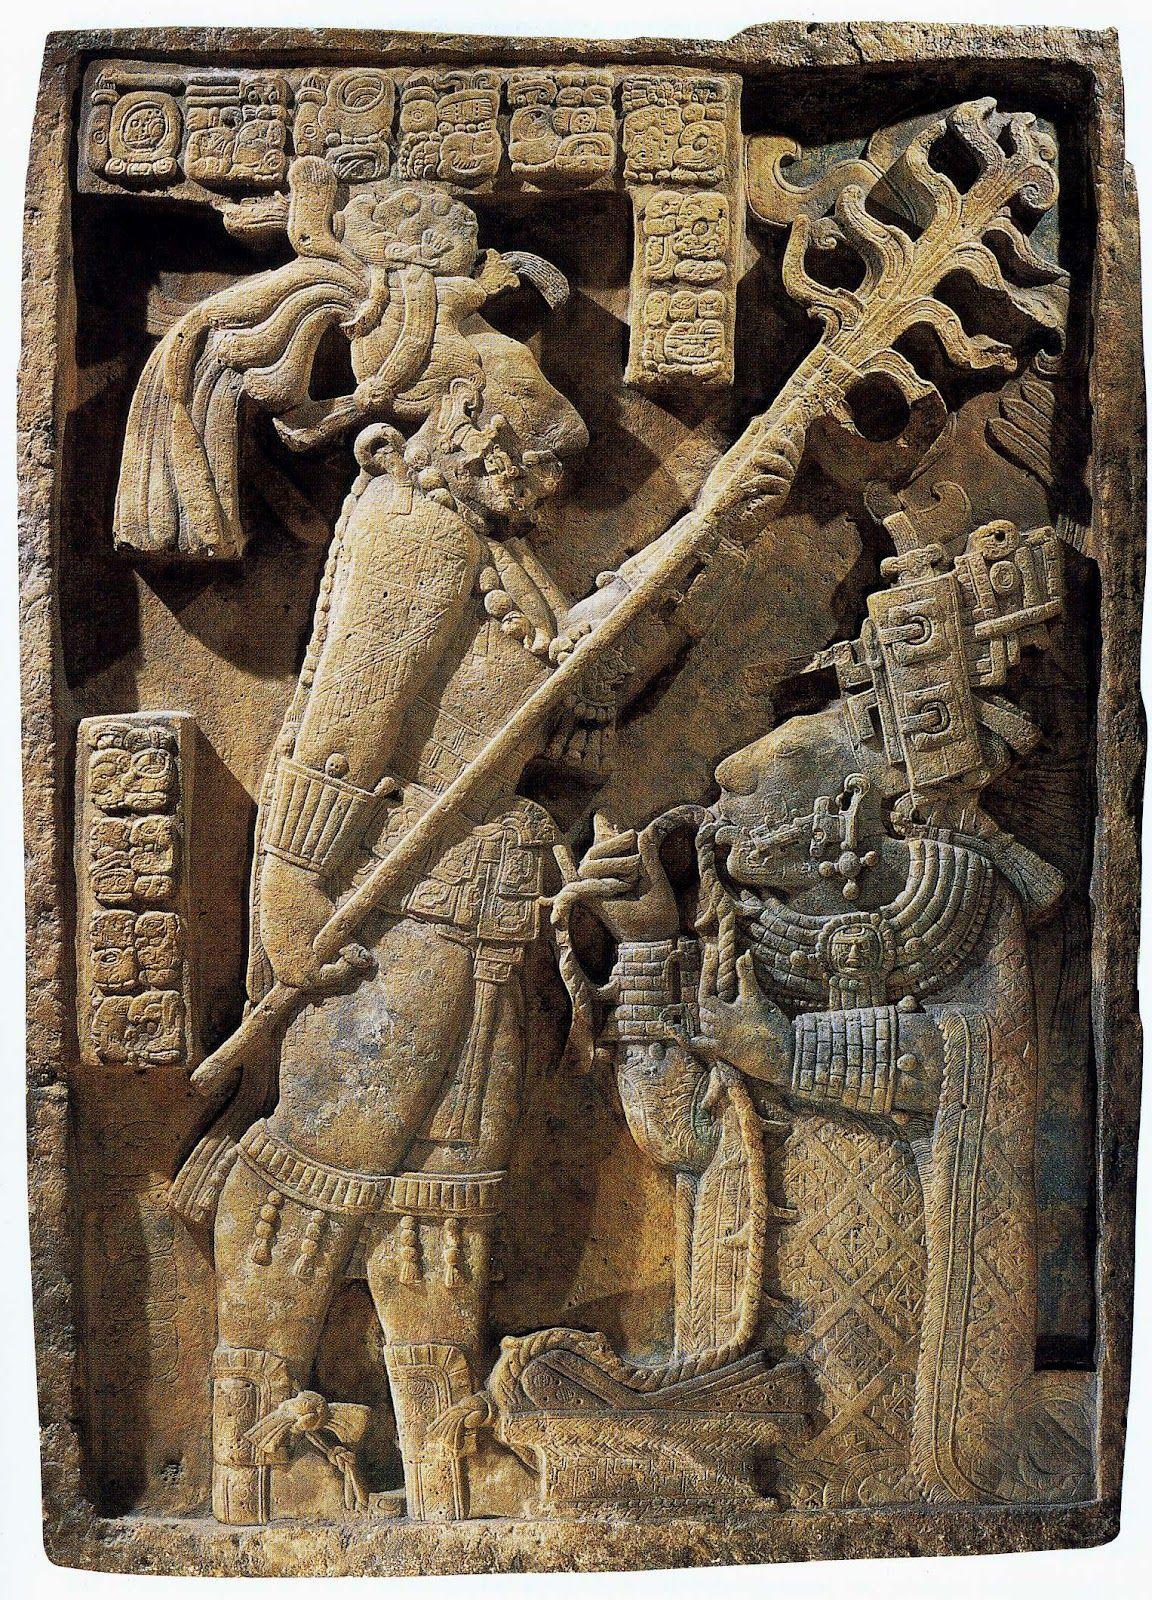 Mayan rituals